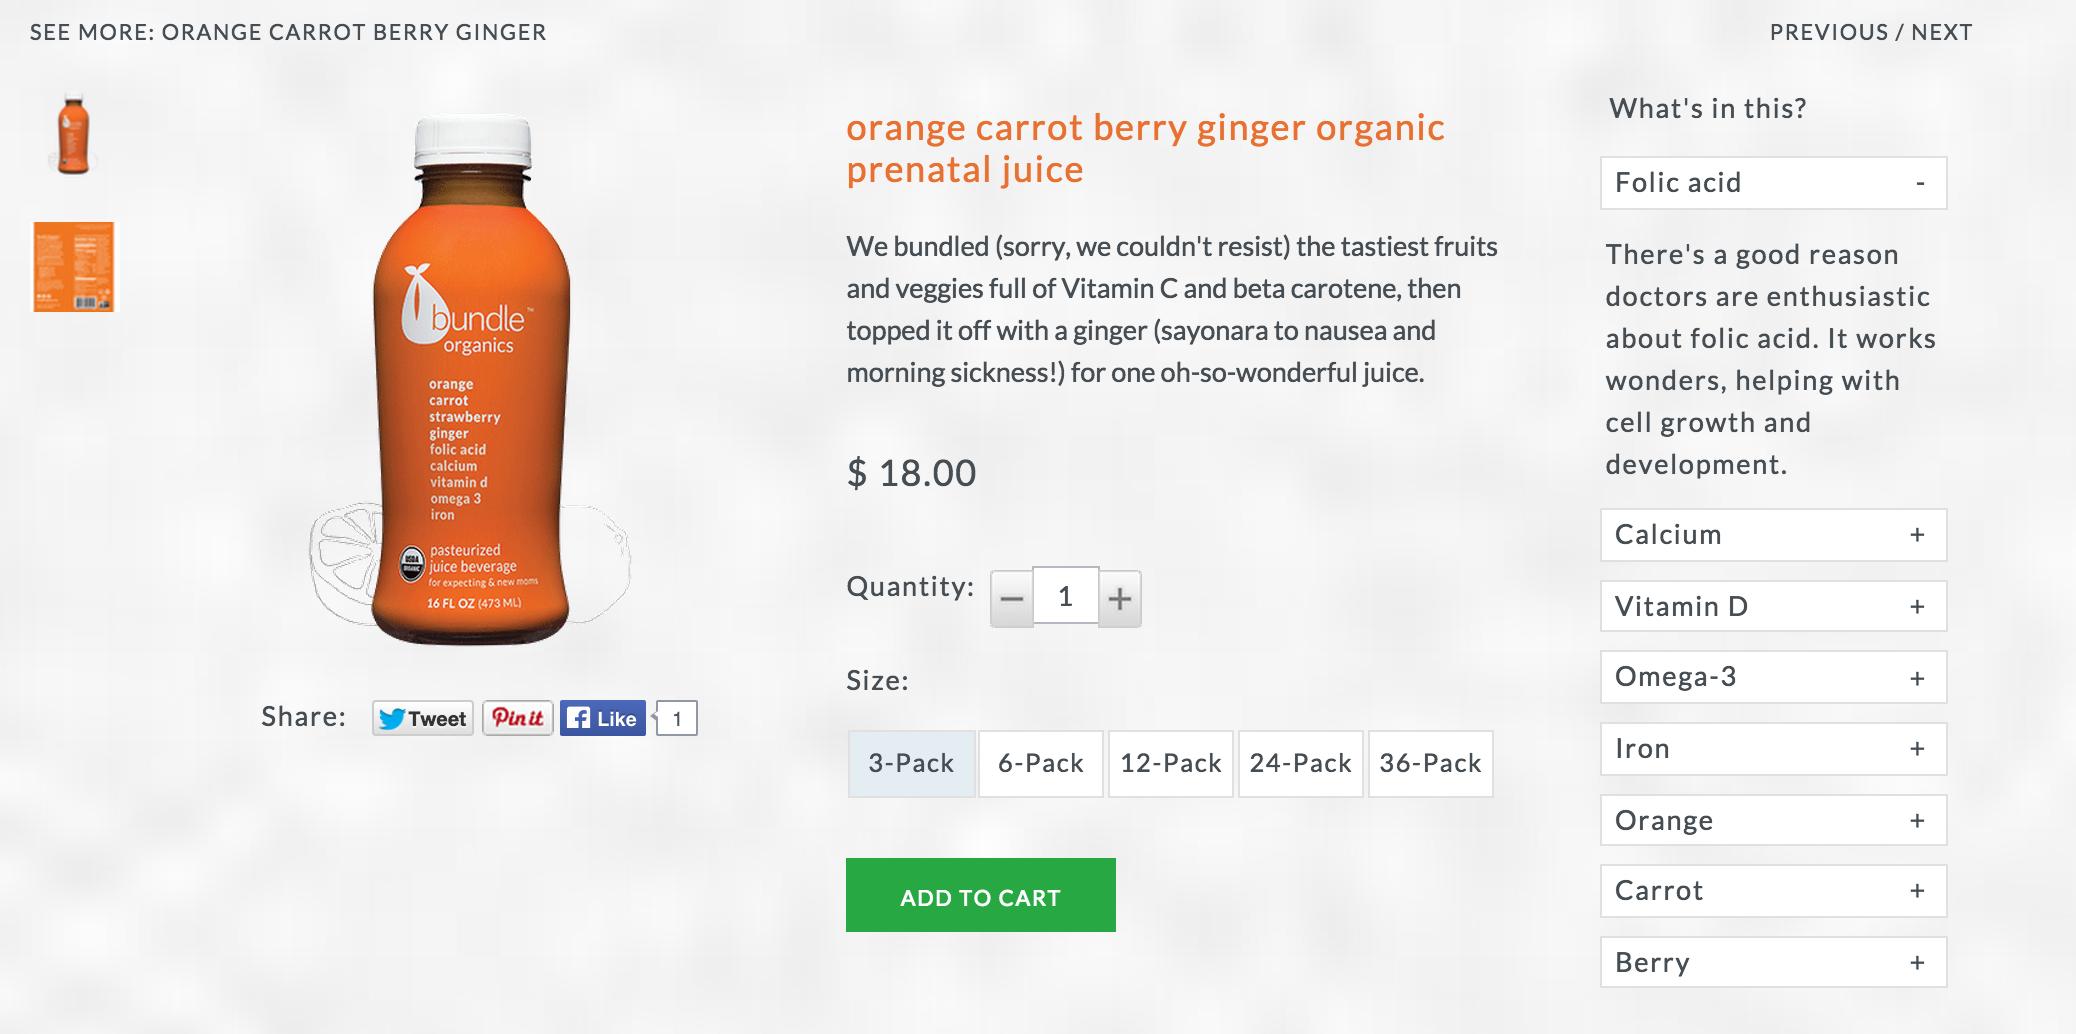 Product Description: Orange Carrot Berry Ginger